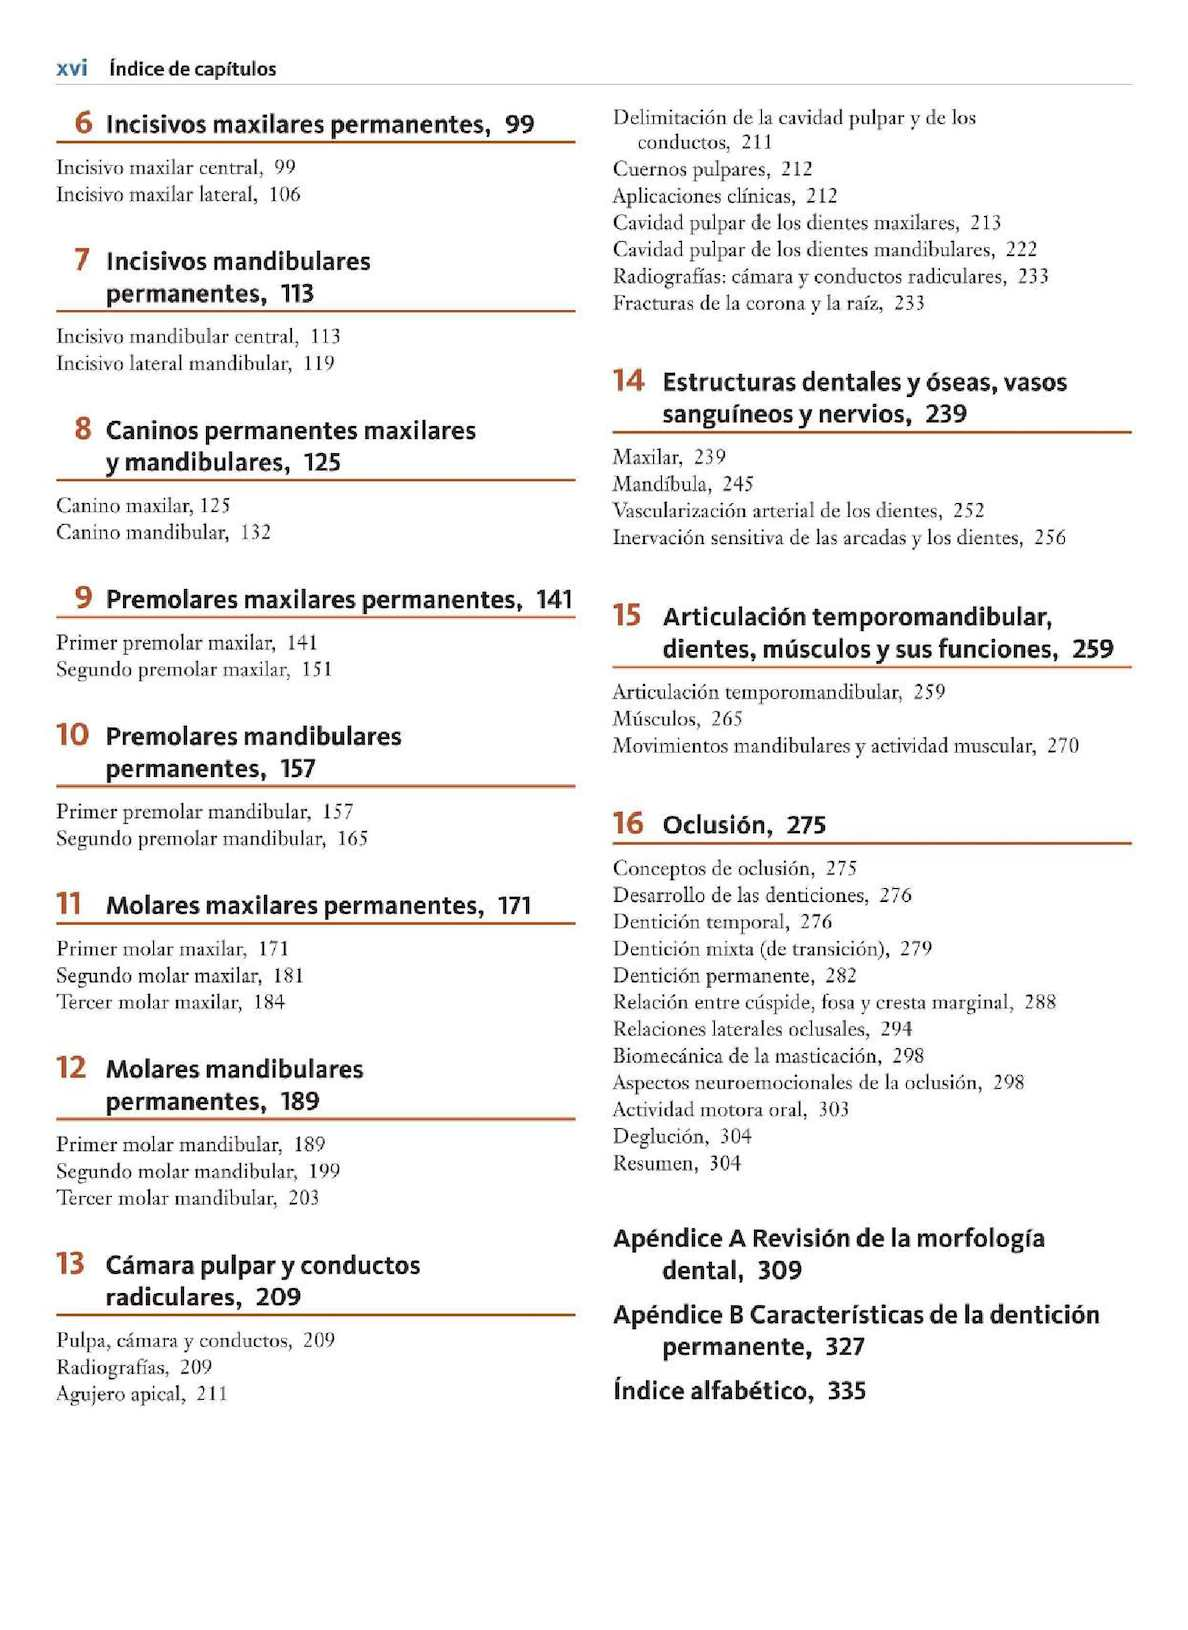 Lujoso Tercero Anatomía Molar Maxilar Adorno - Anatomía de Las ...